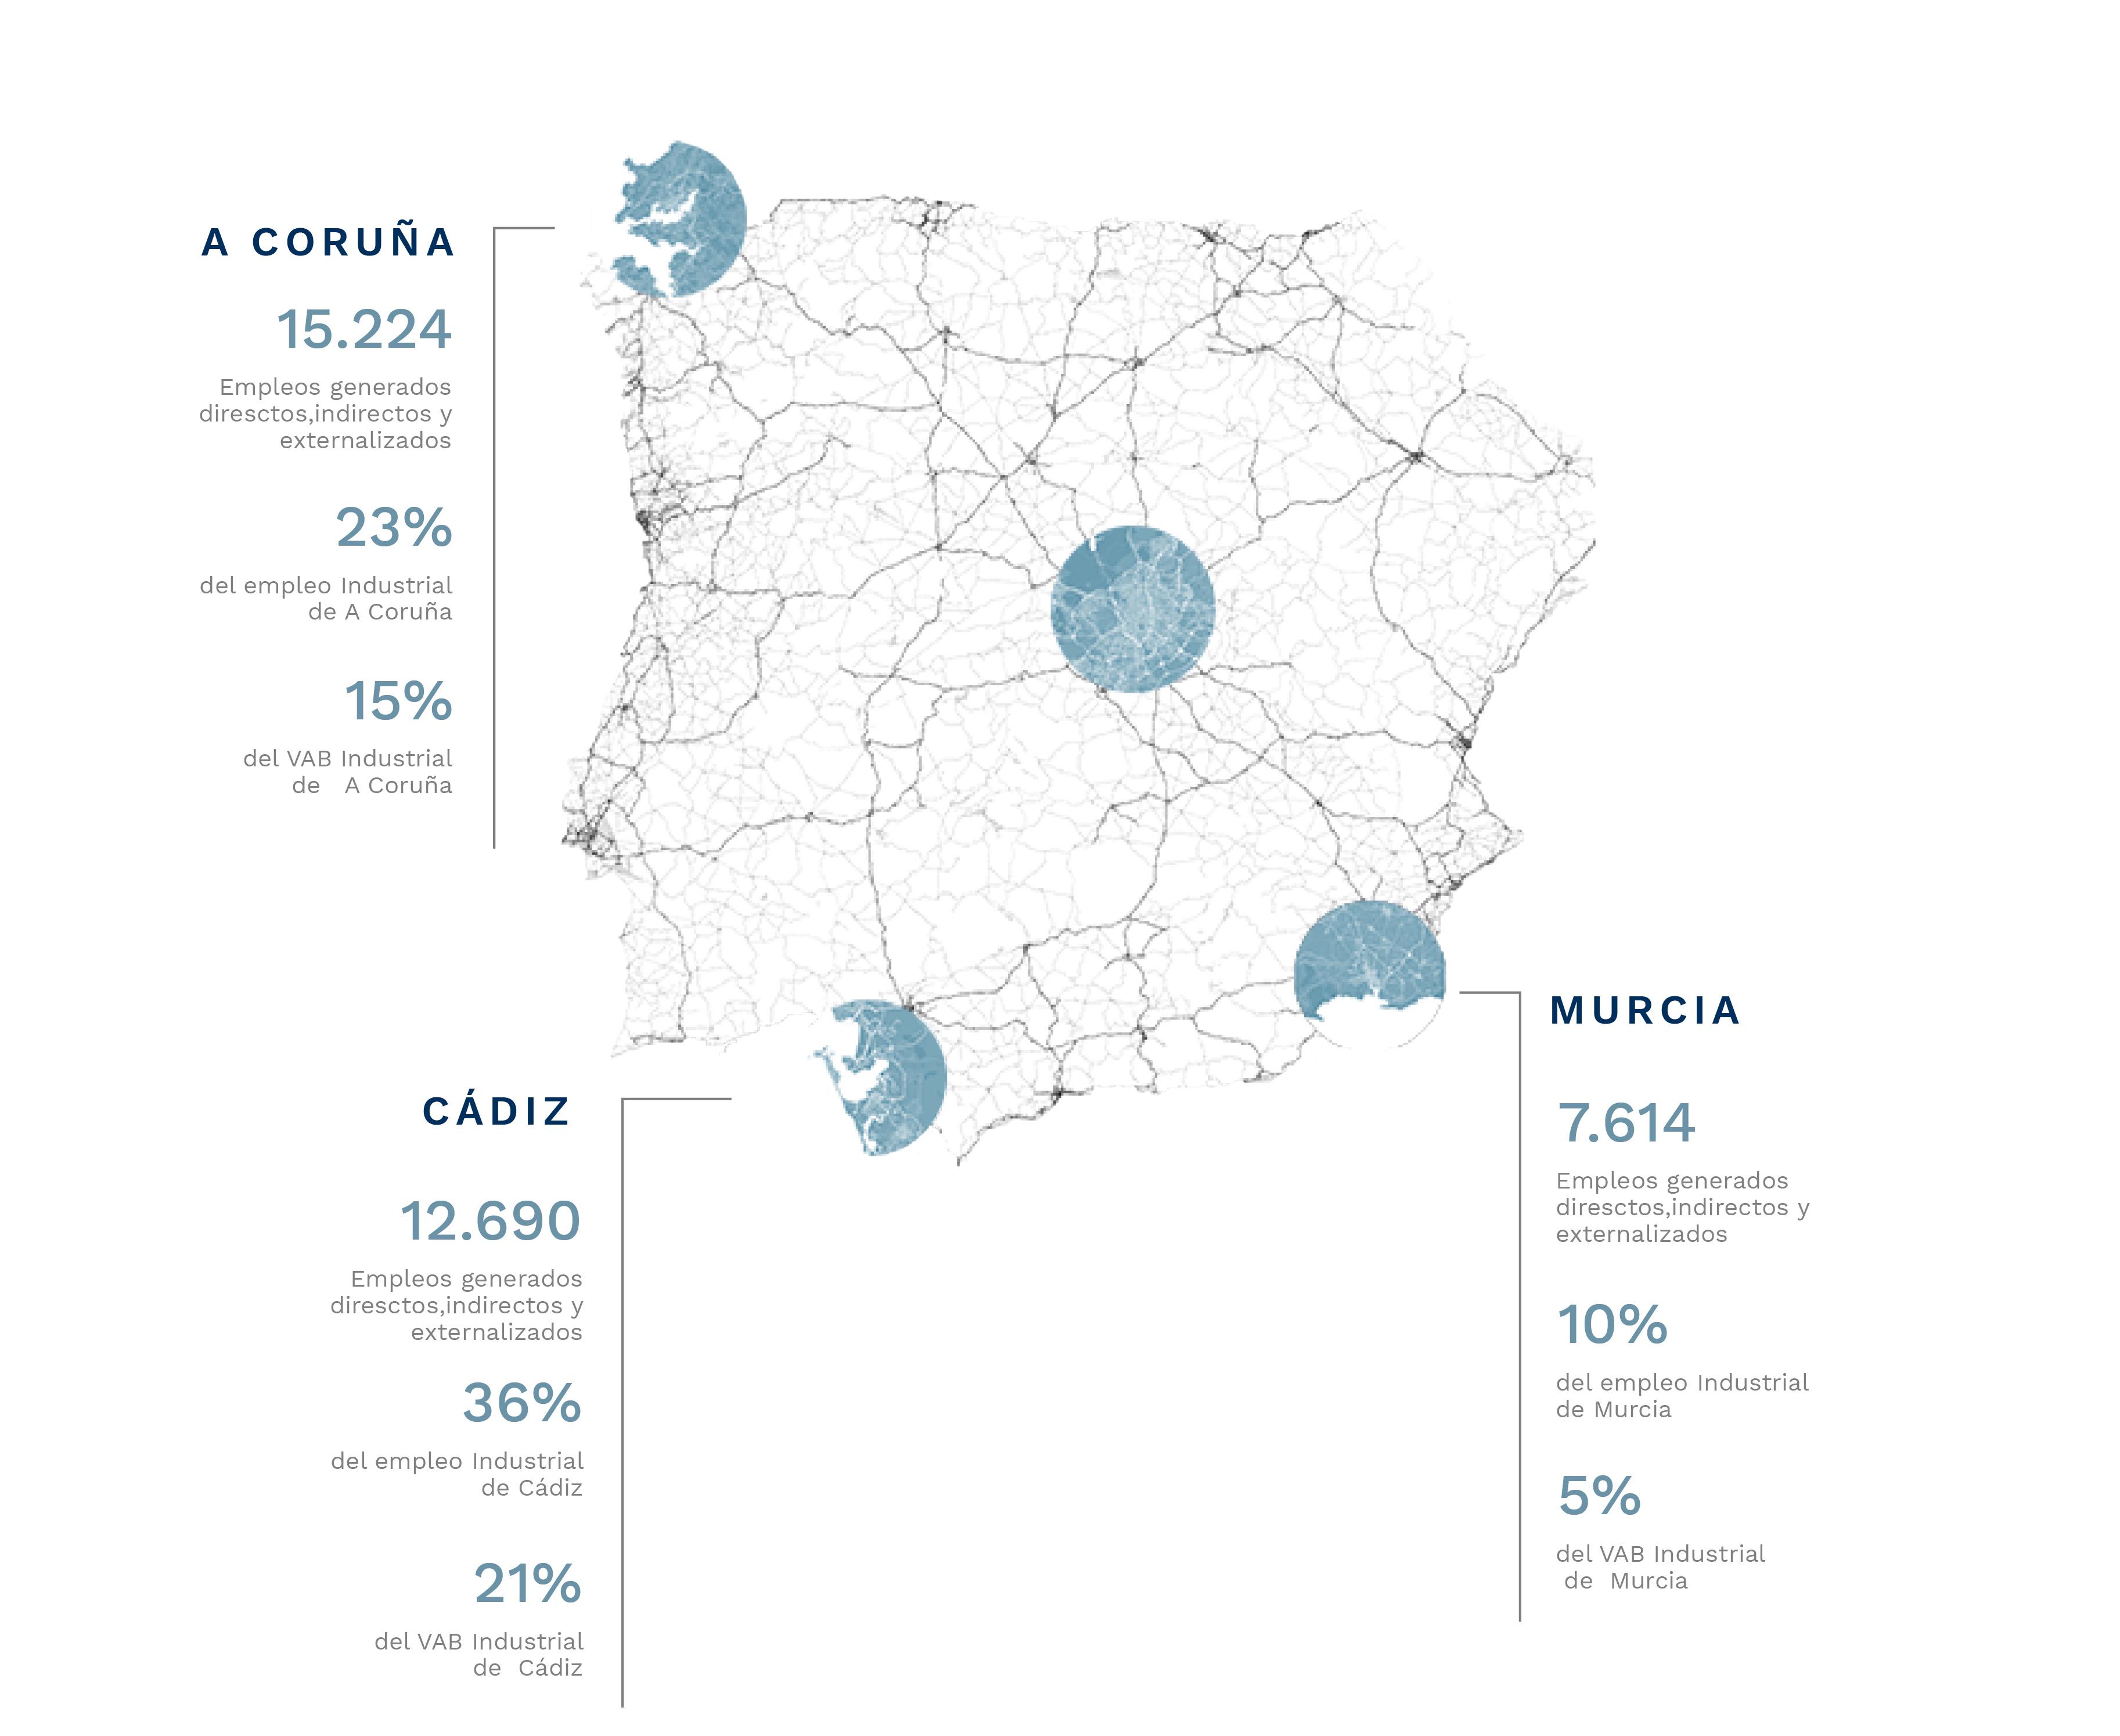 Empleo que Navantia genera en España